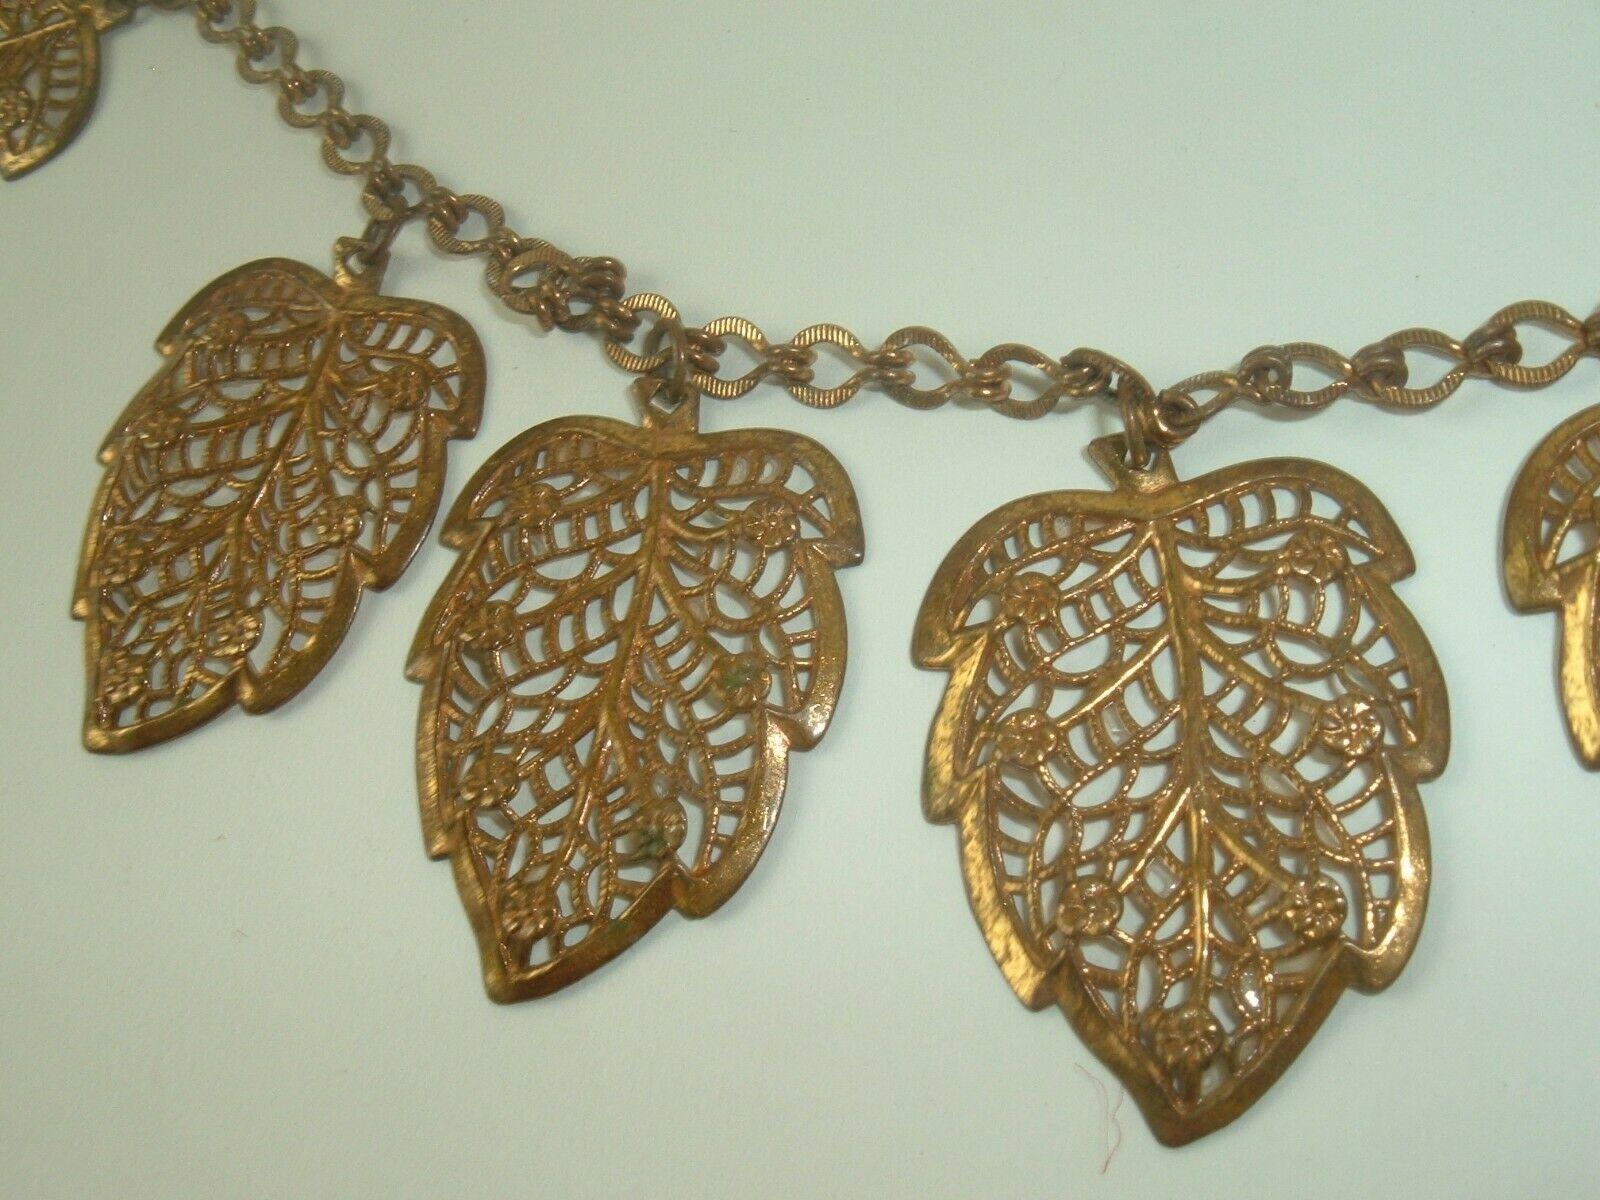 Antique Necklace Metal Filigree leaves chain link gold tone Victorian Vintage